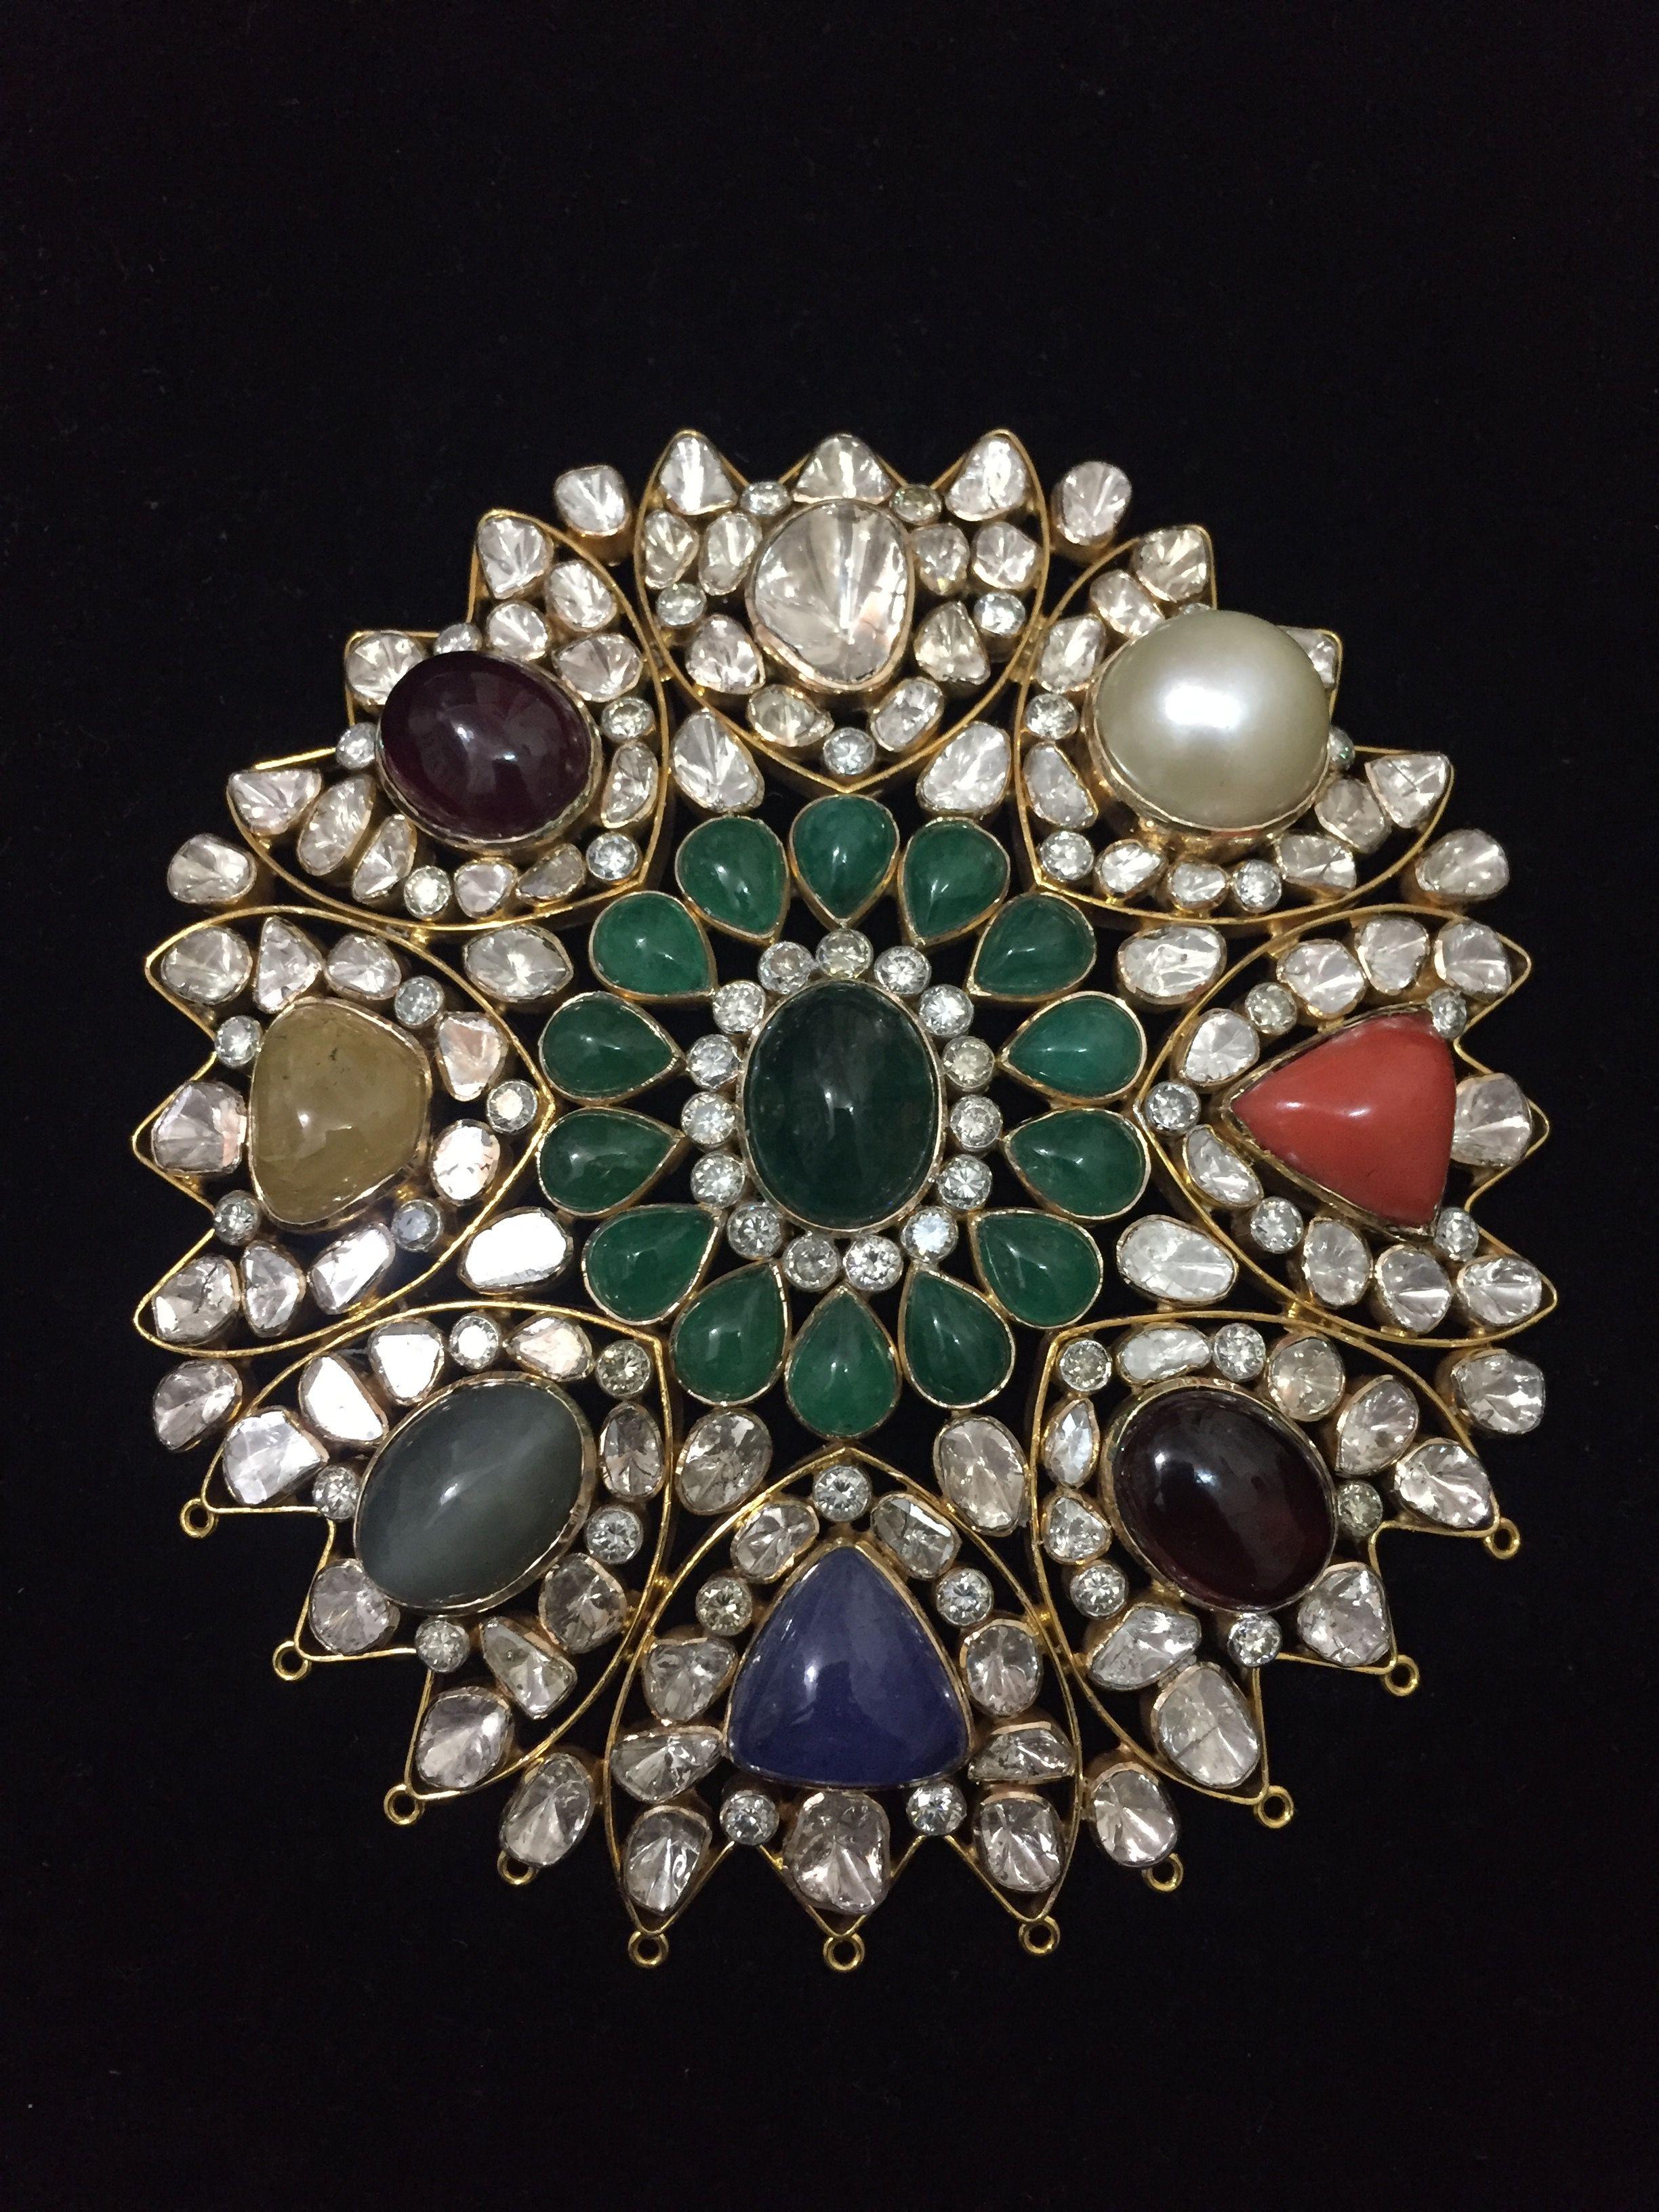 Pin by mayurius on jewelry pinterest pendant set pendants and gems